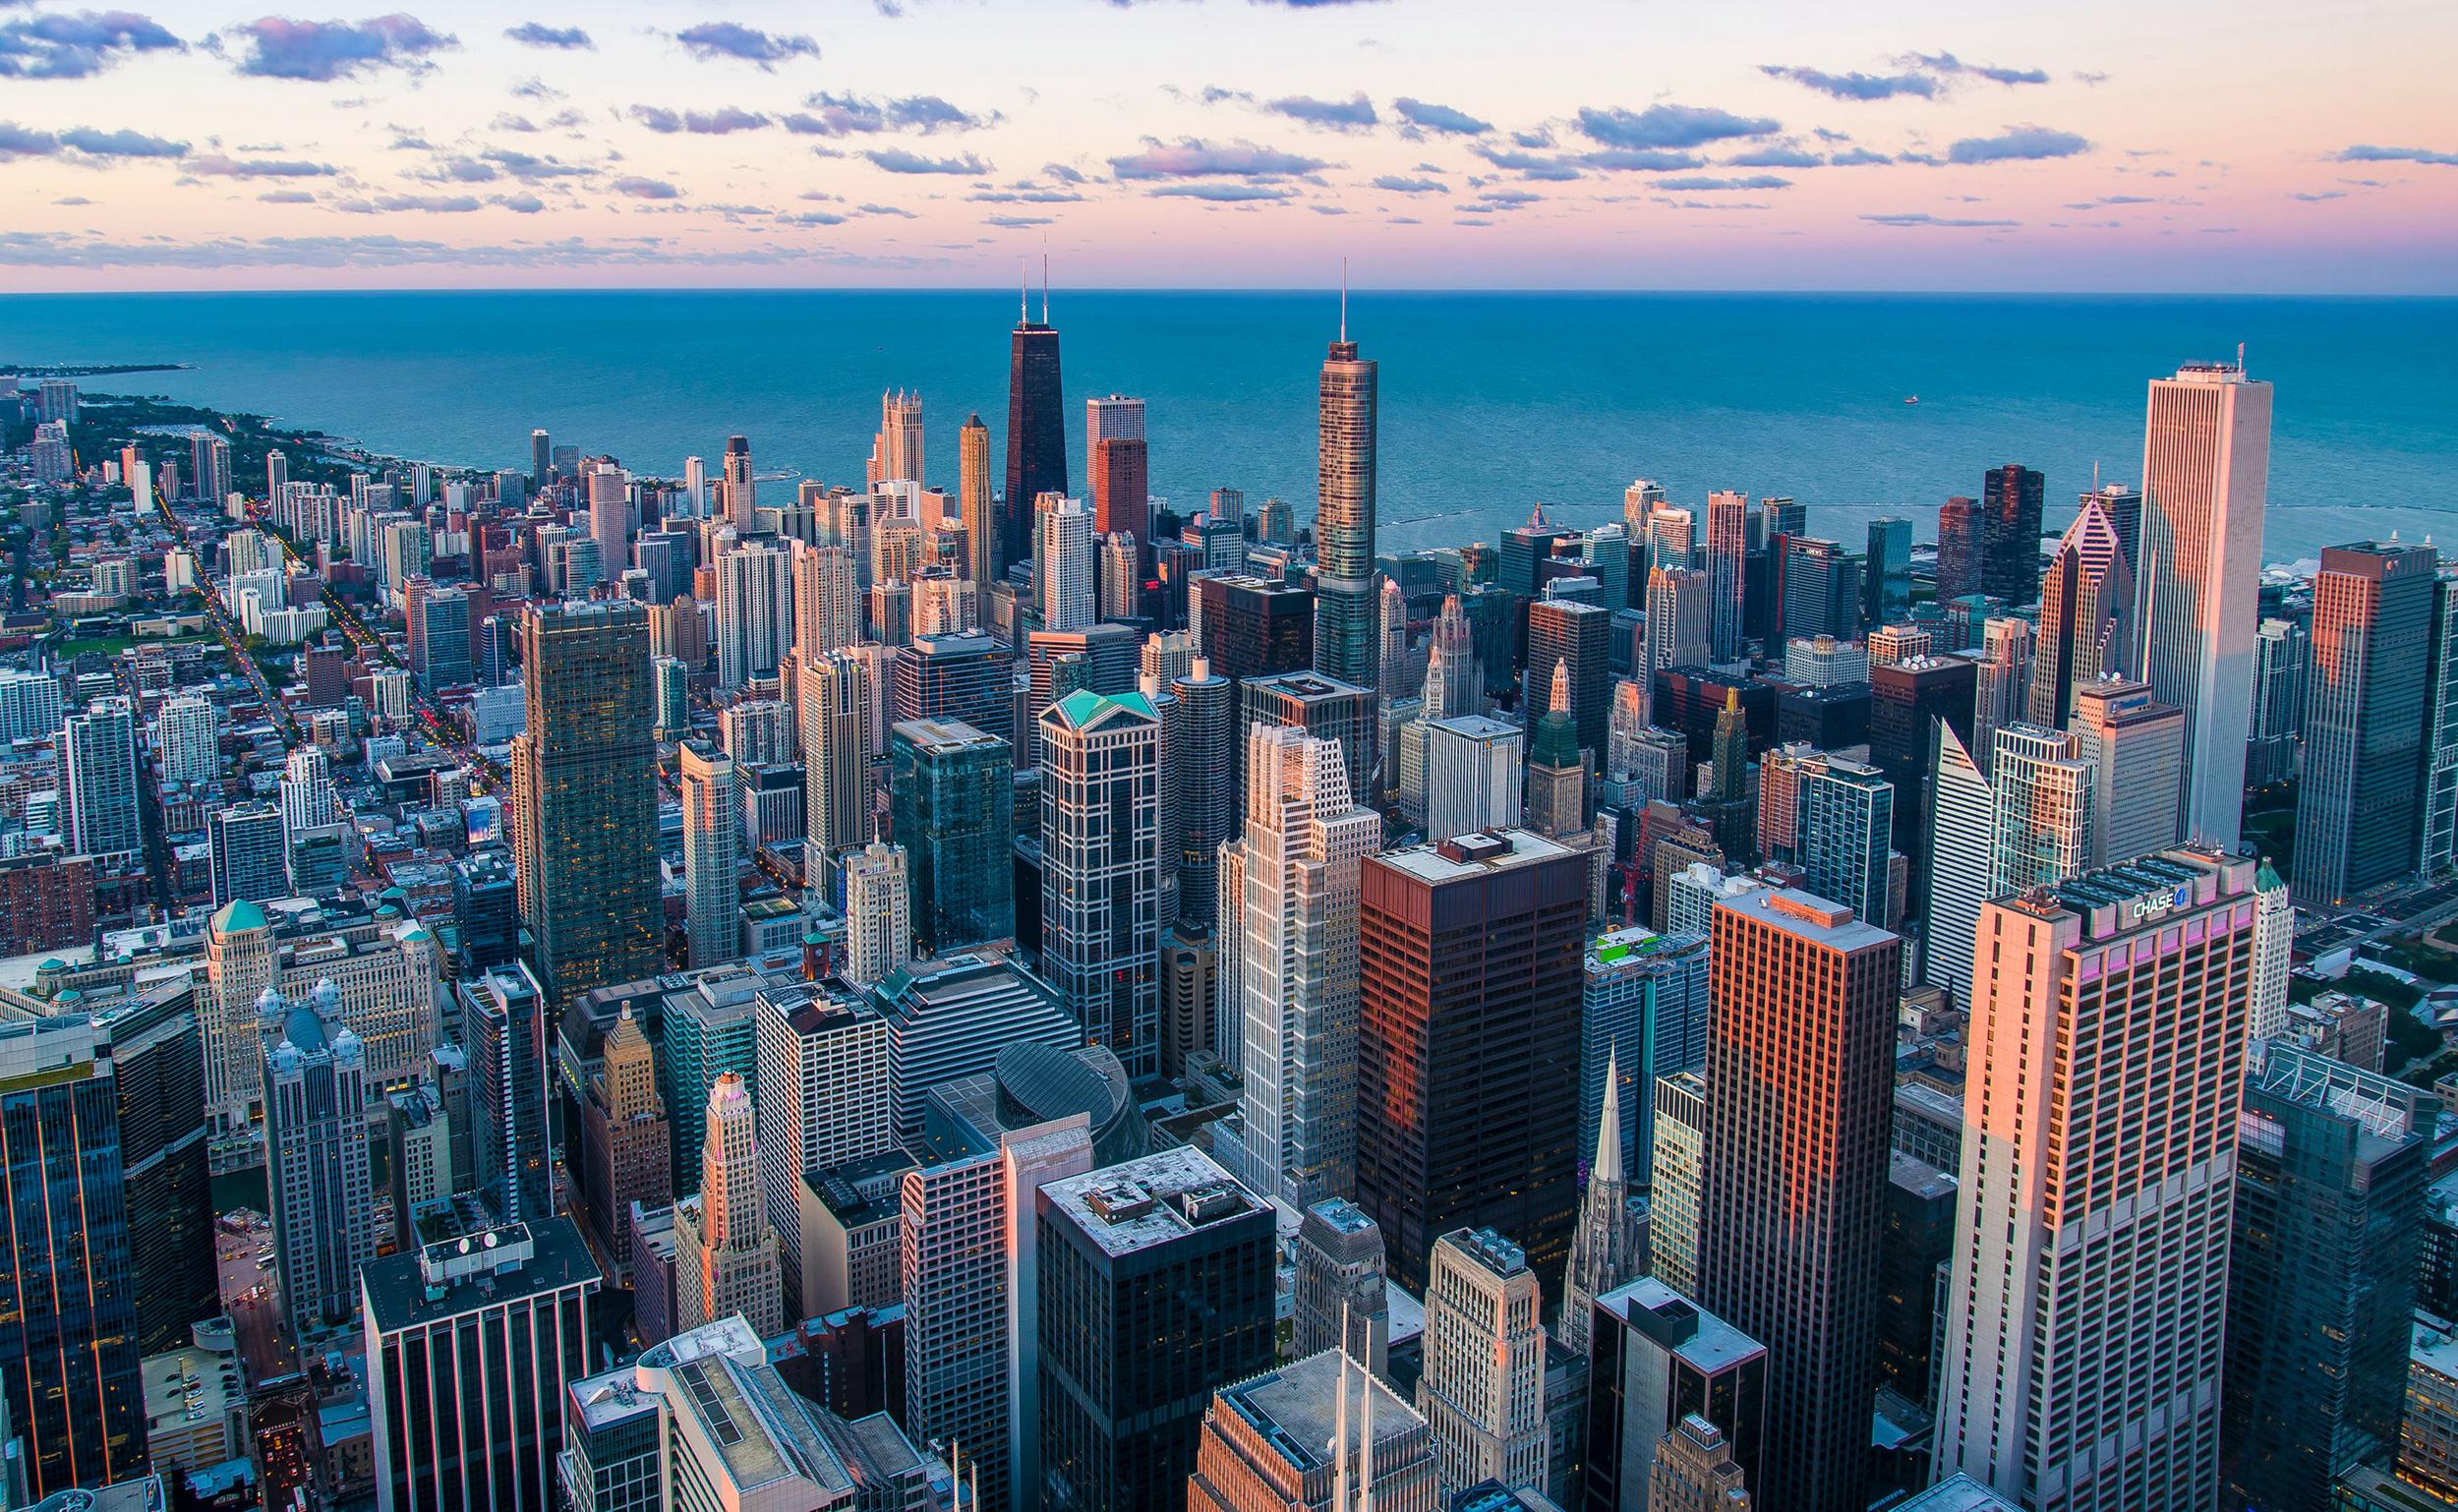 Bird's eye view of Chicago